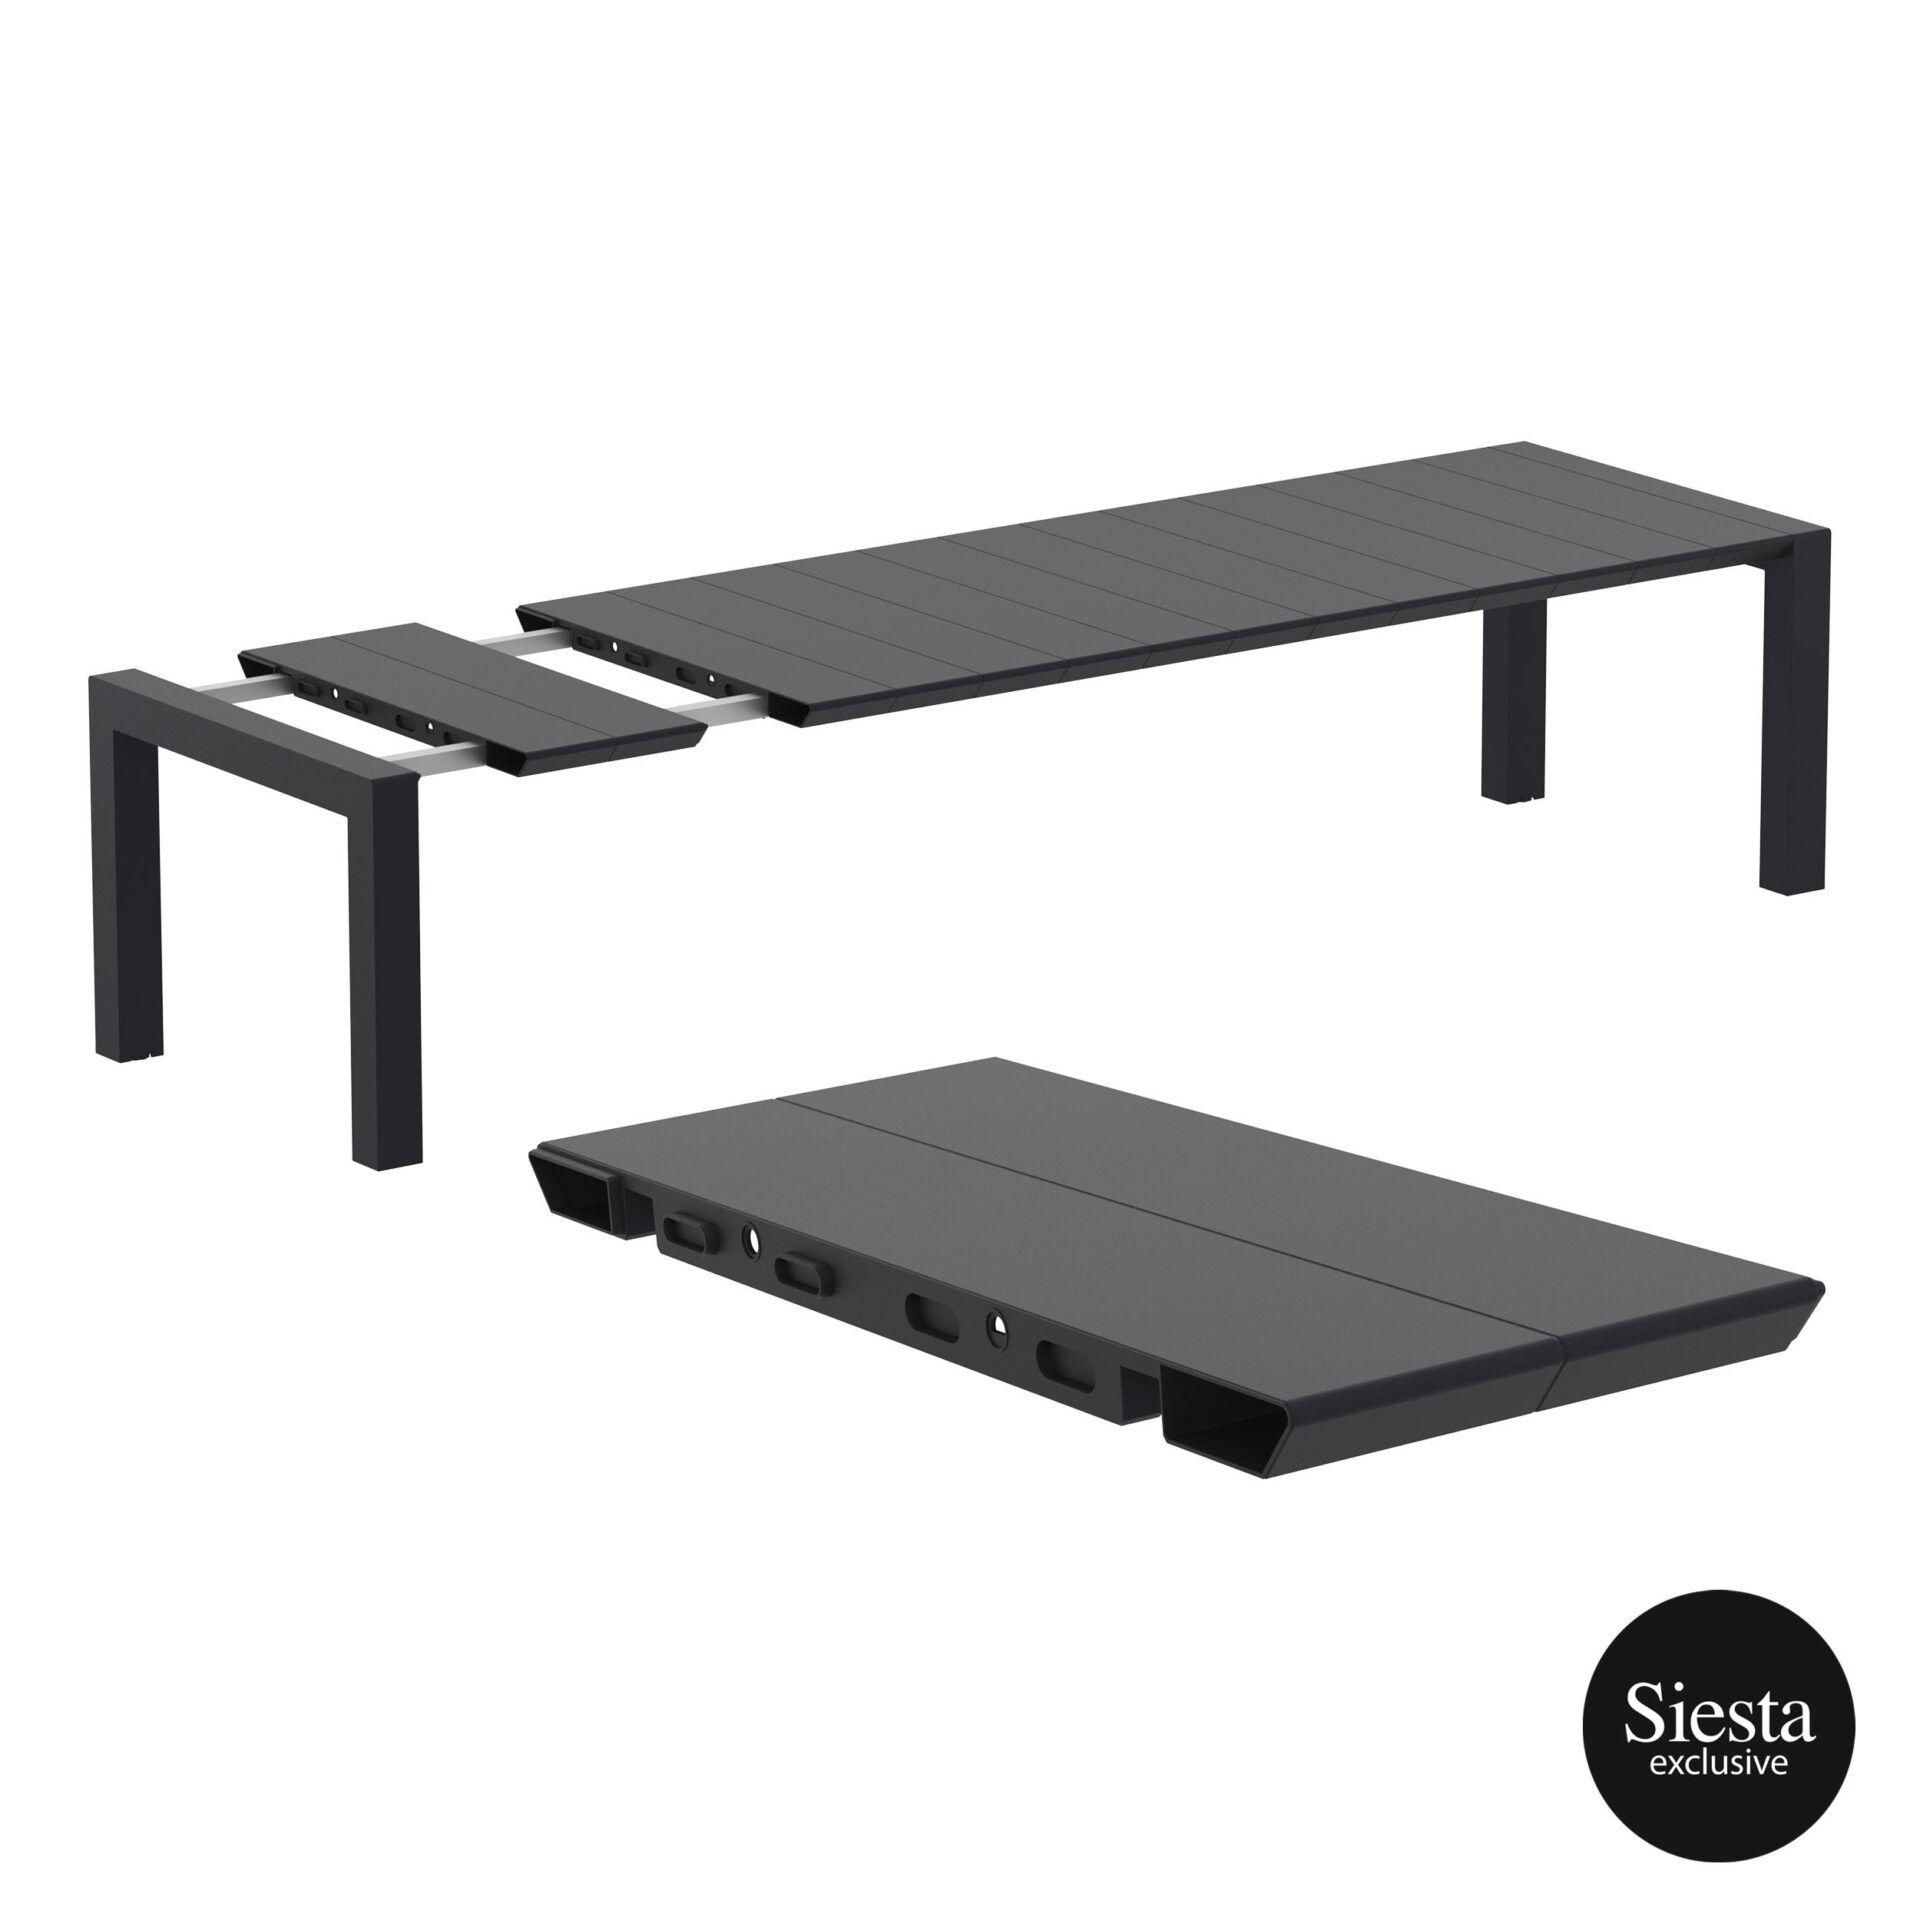 001 vegas table xl 300 black extension part